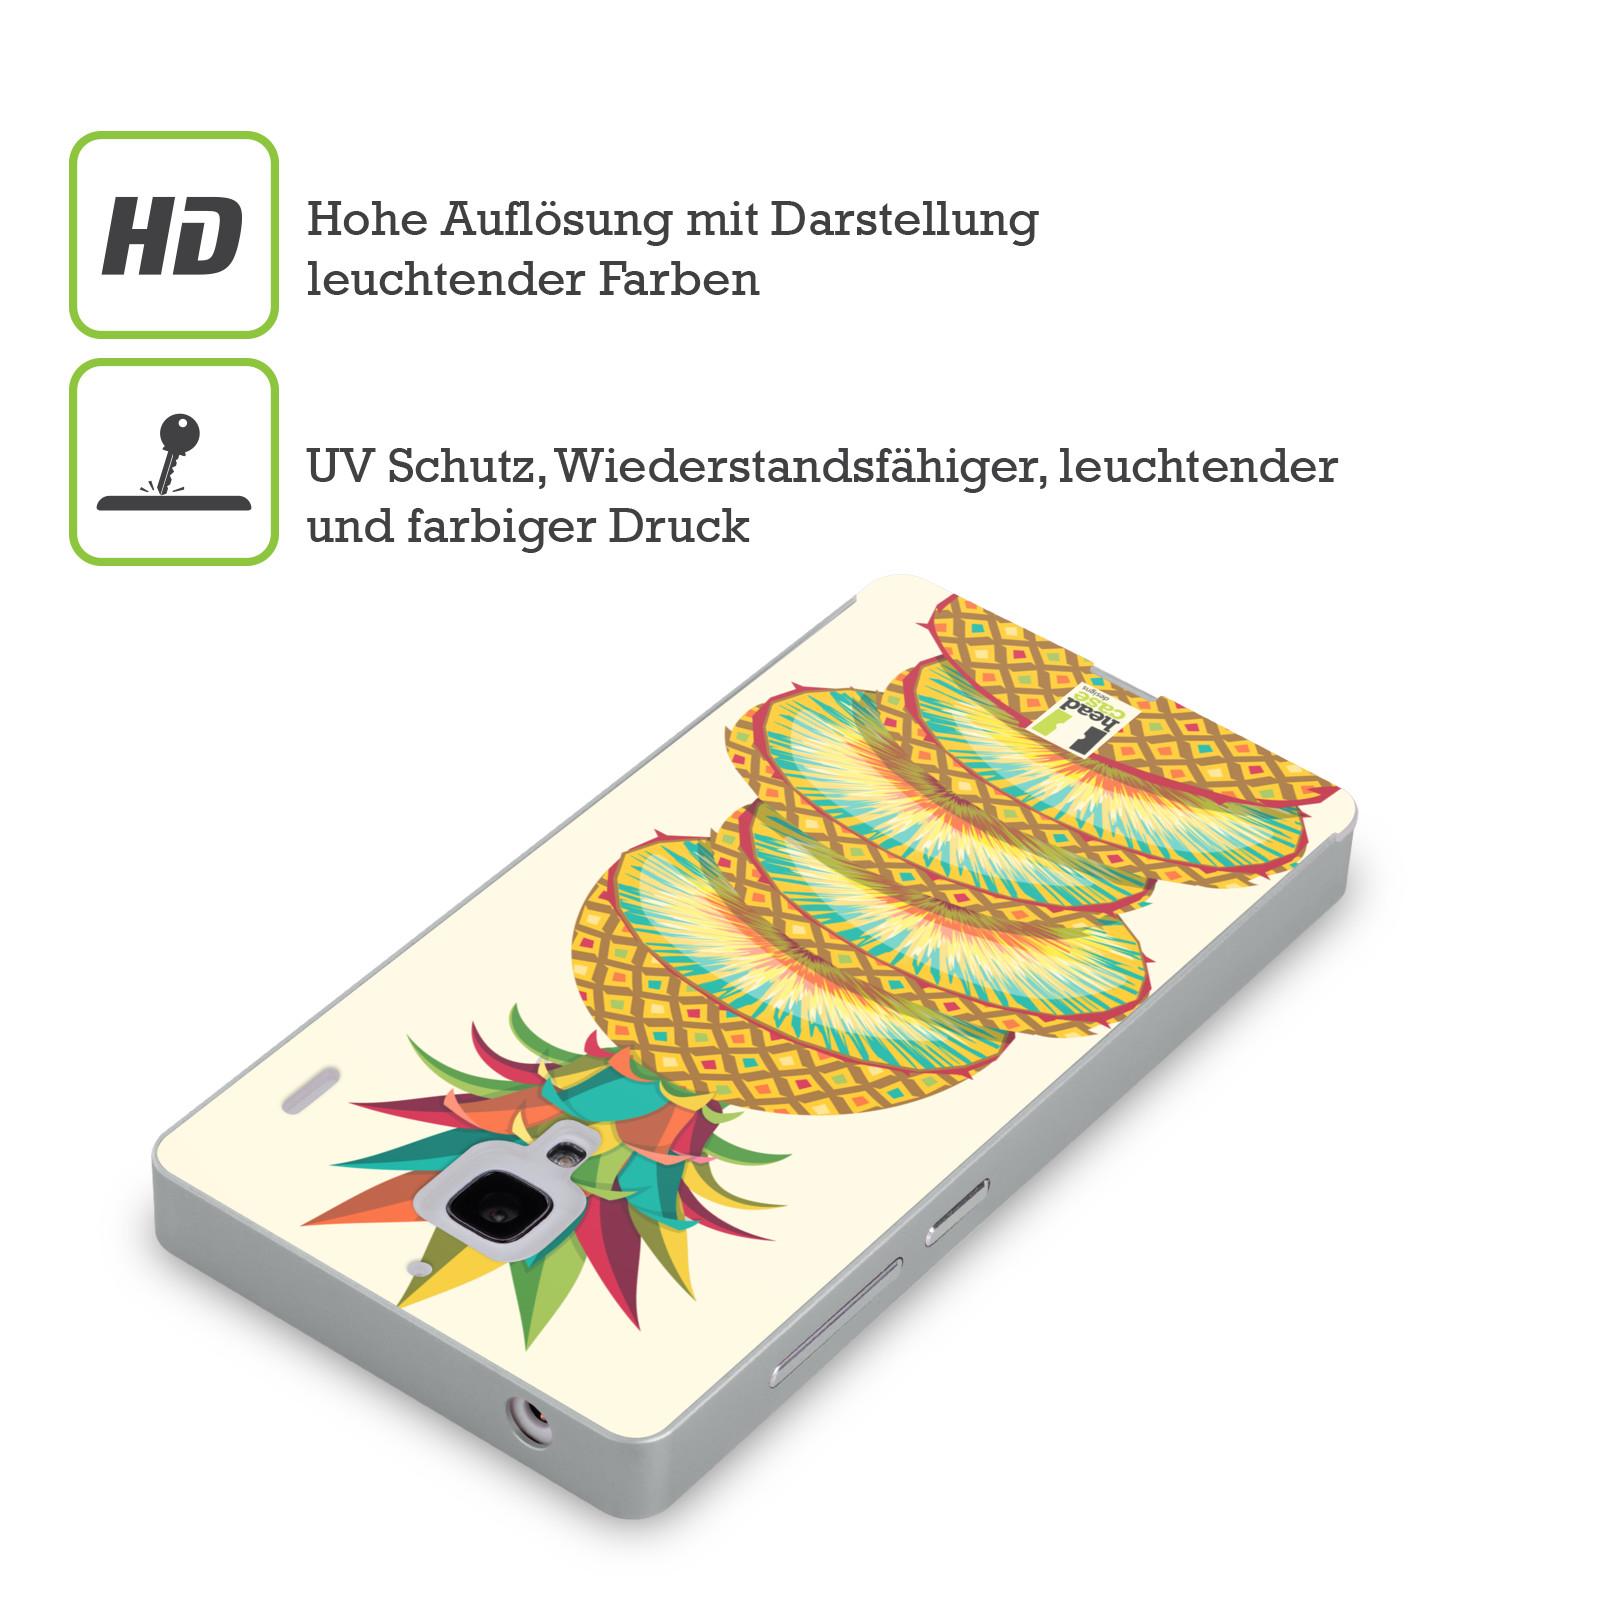 HEAD-CASE-DESIGNS-BUNTEN-FRUCHTE-SILBER-RAHMEN-HULLE-FUR-HUAWEI-XIAOMI-HANDYS